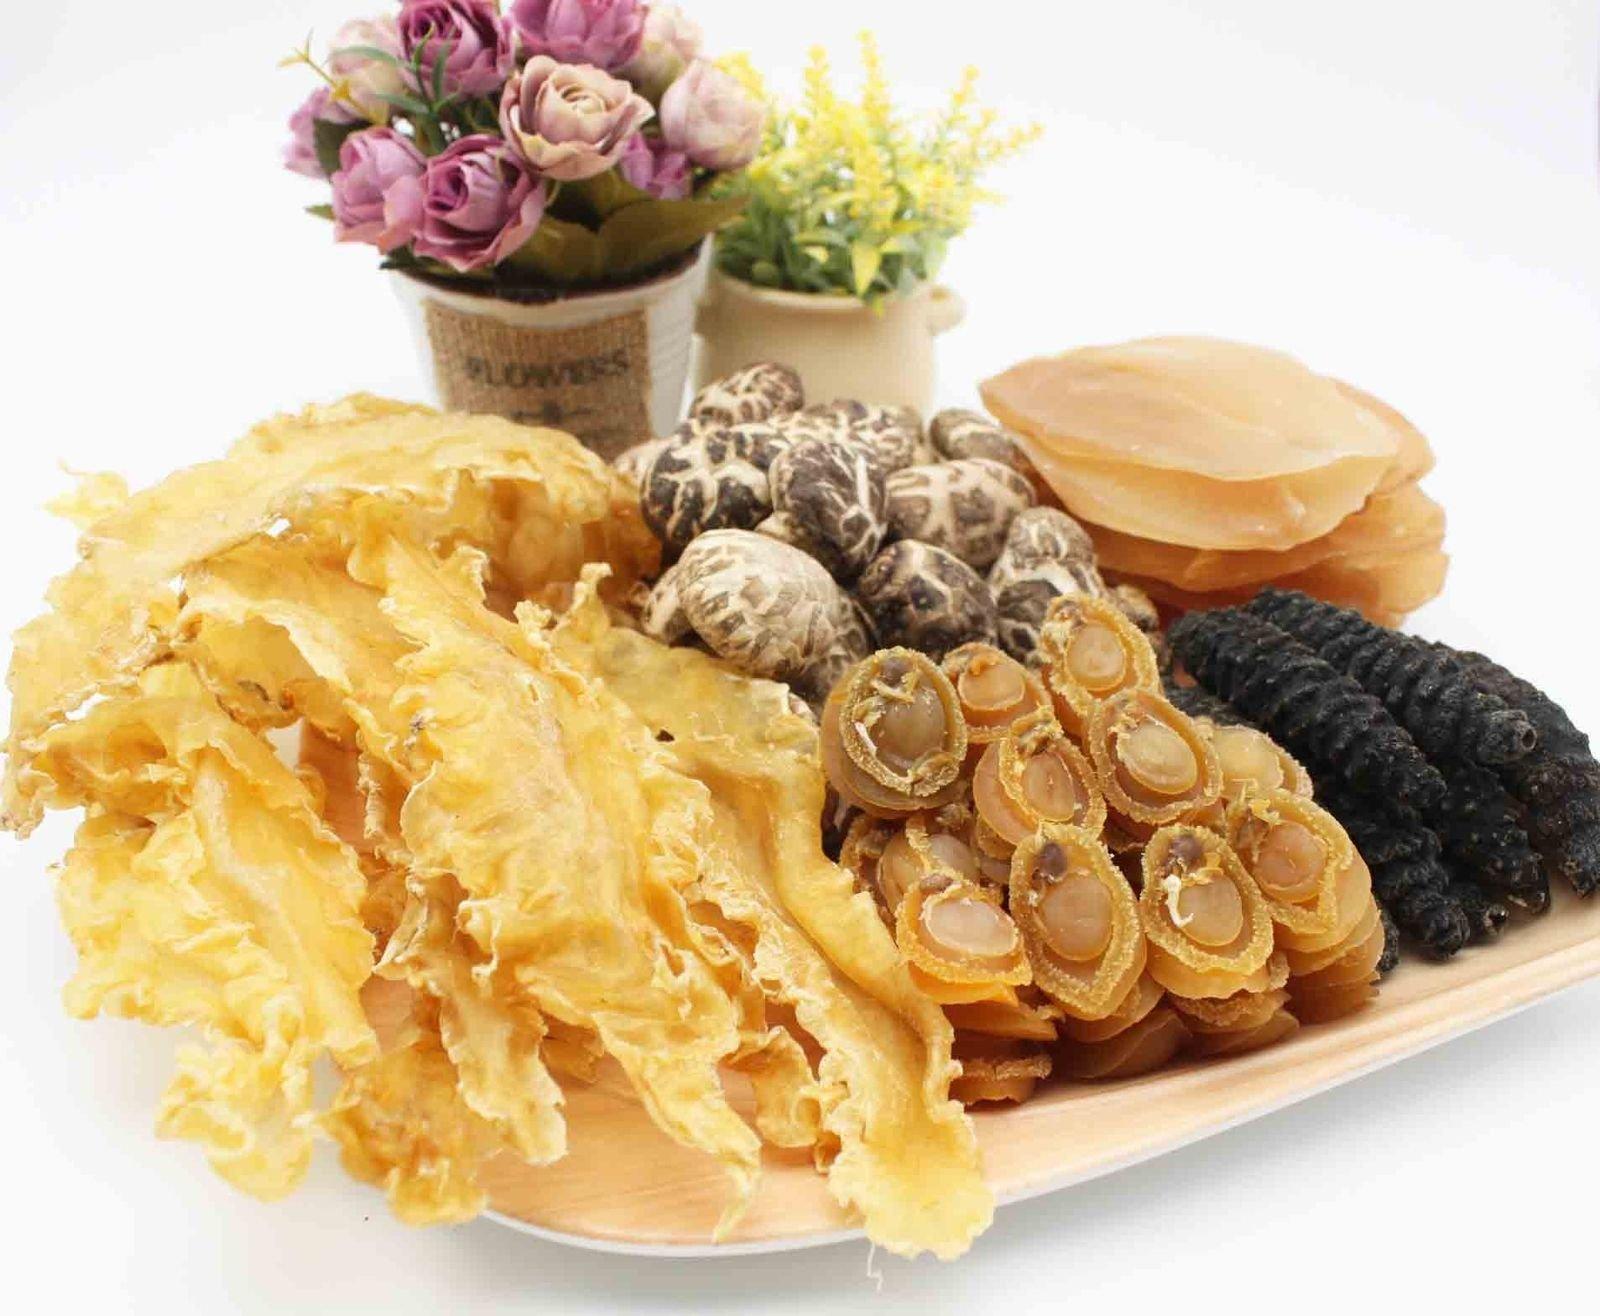 China Good Food Set-35 Dried Fish Maw x Dalian Abalones x Sea Cucumbers x Mushroom x Conch Slice